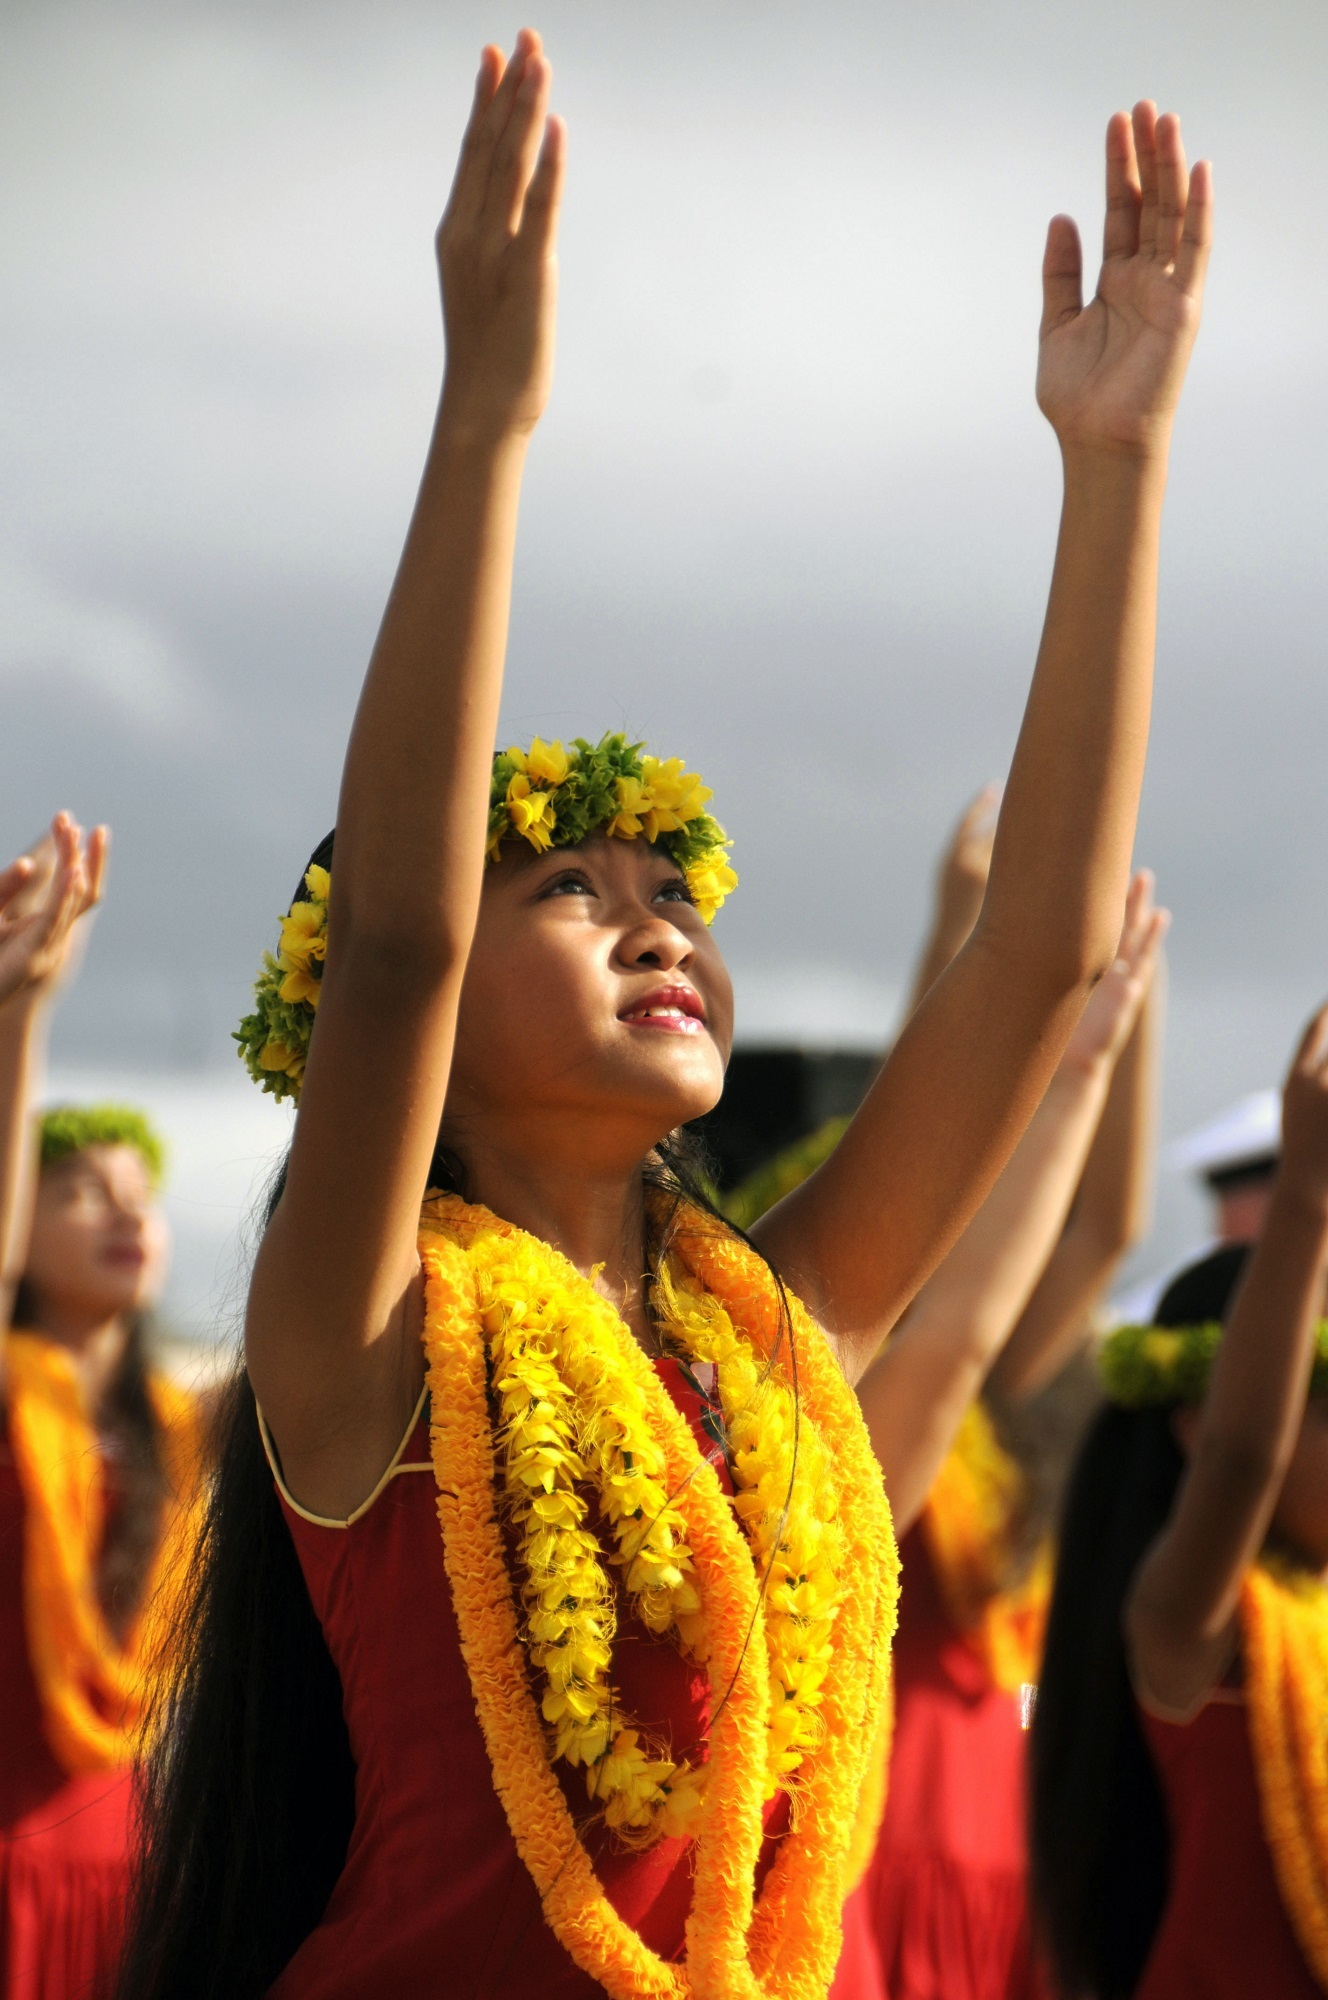 A Hawaiian girl wearing a traditional lei